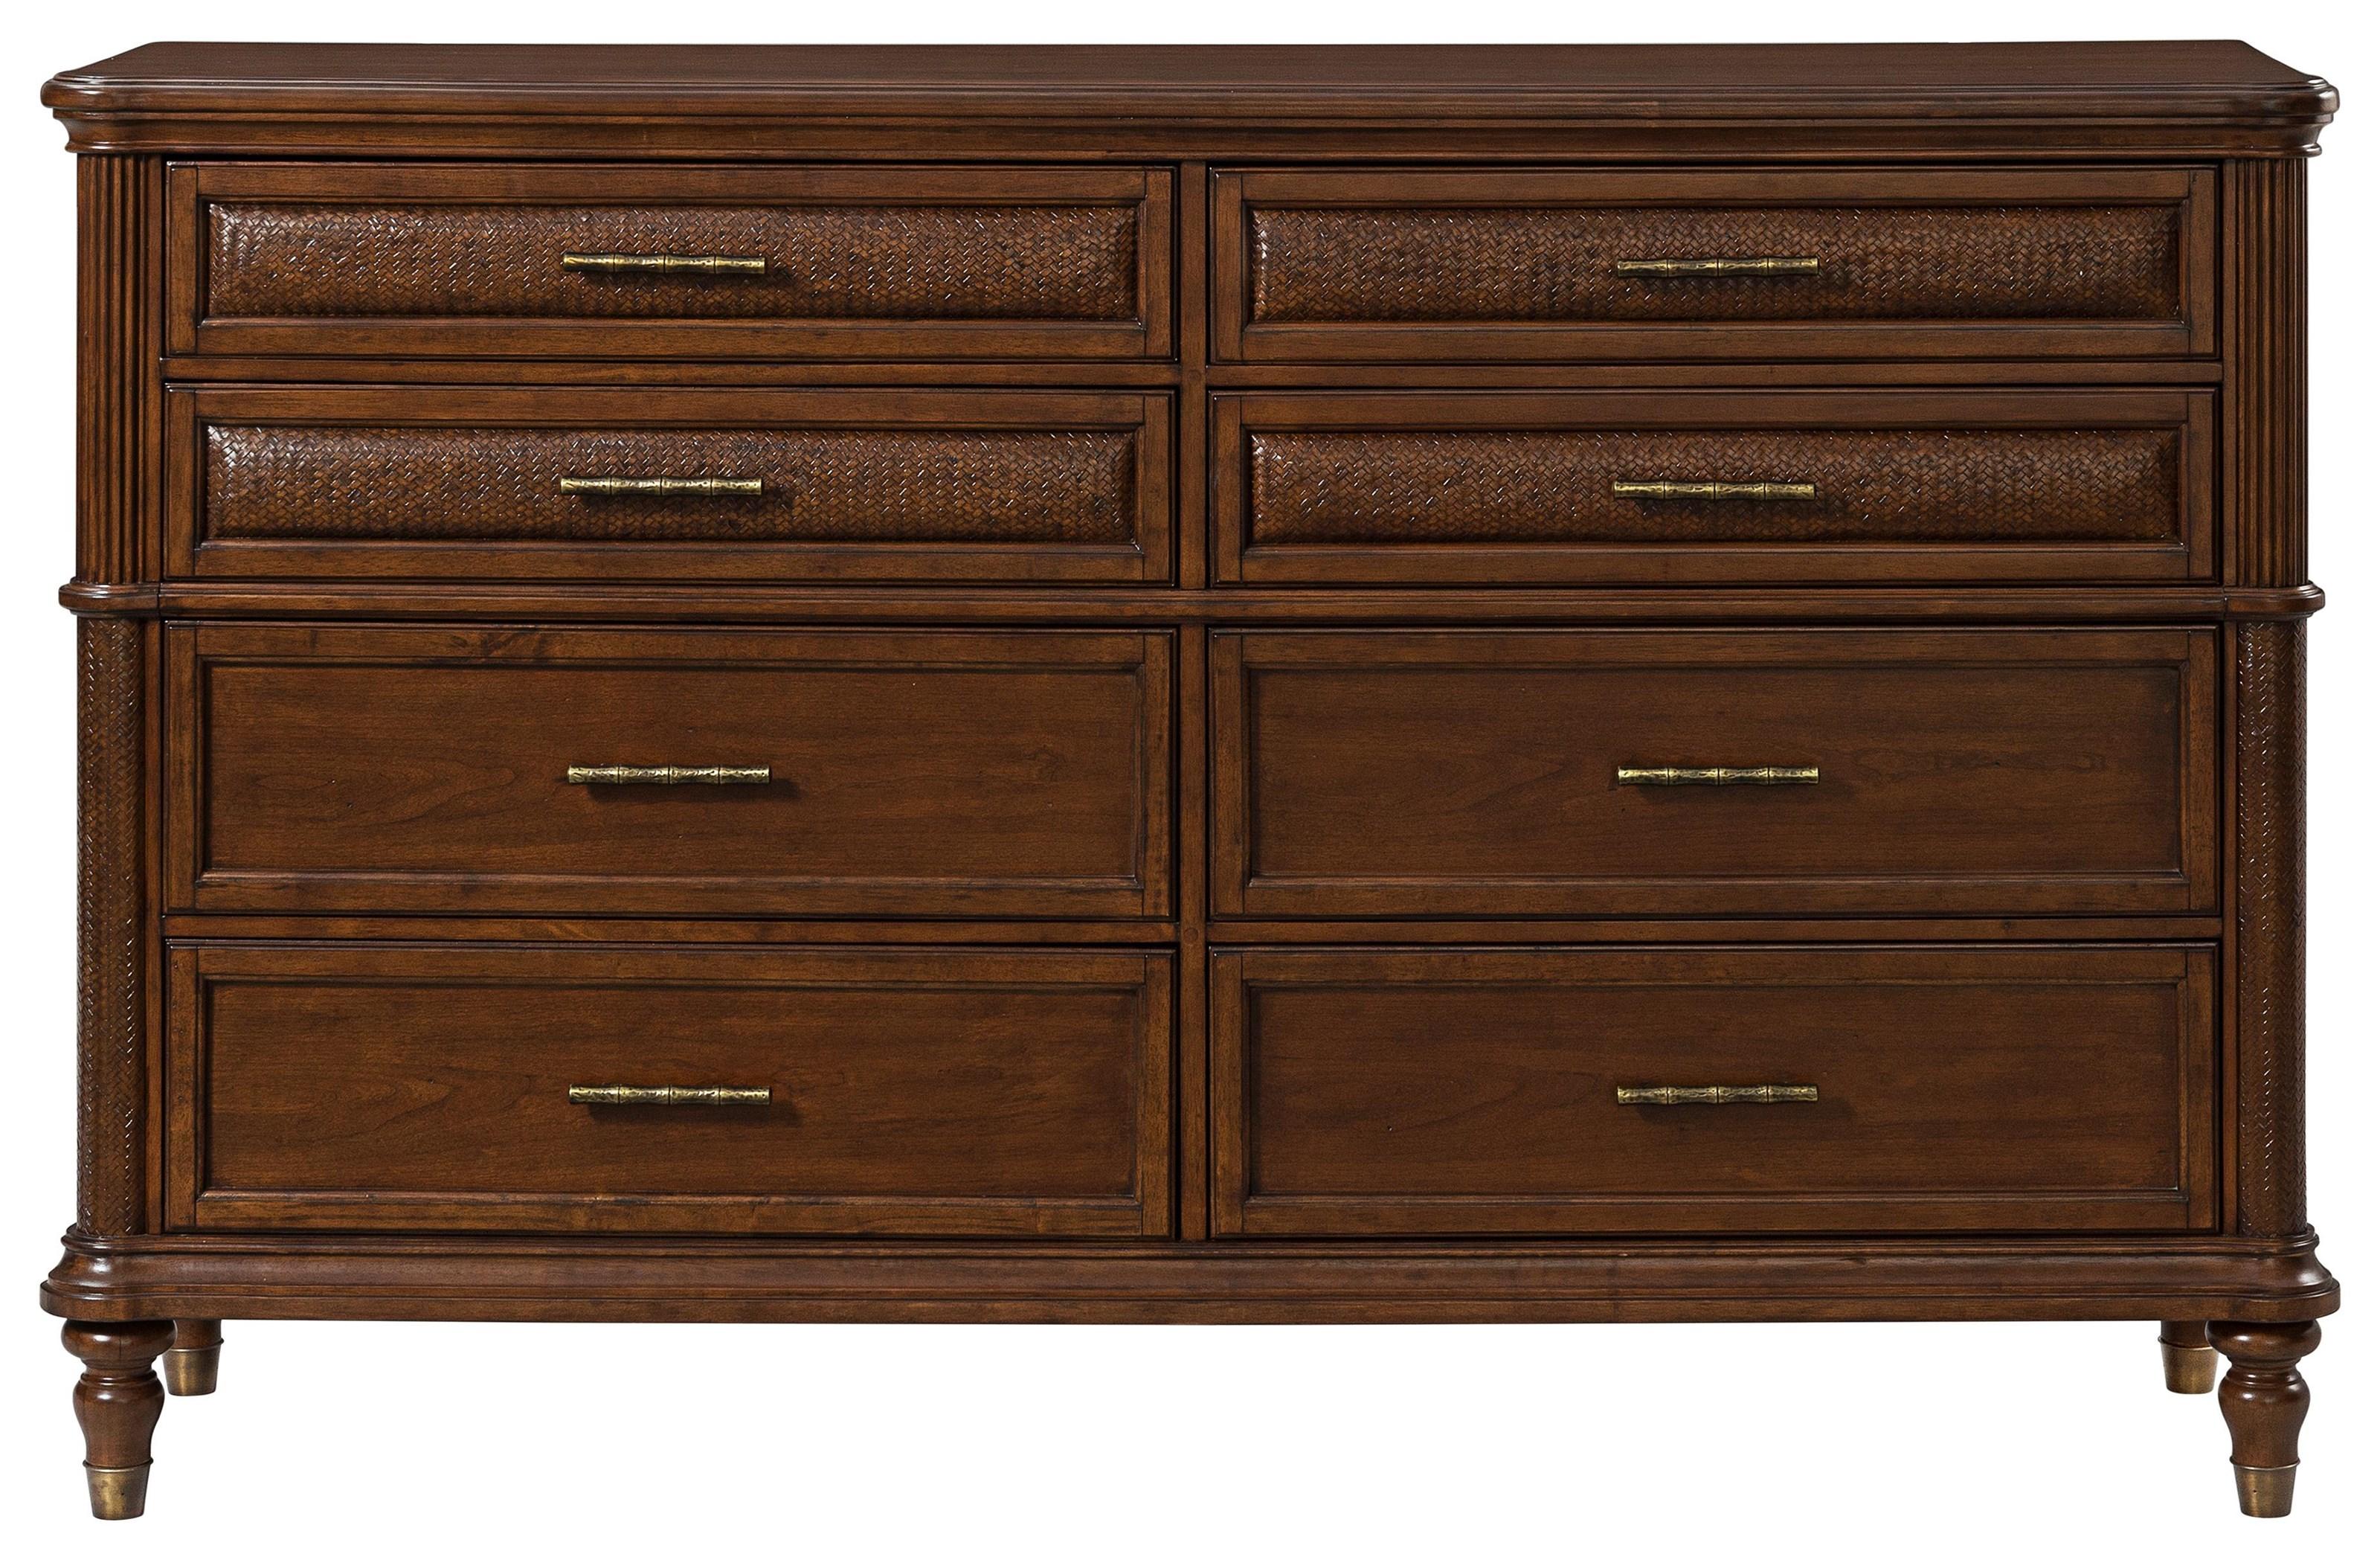 Tropical Breeze Dresser by Stillwater Furniture at Baer's Furniture